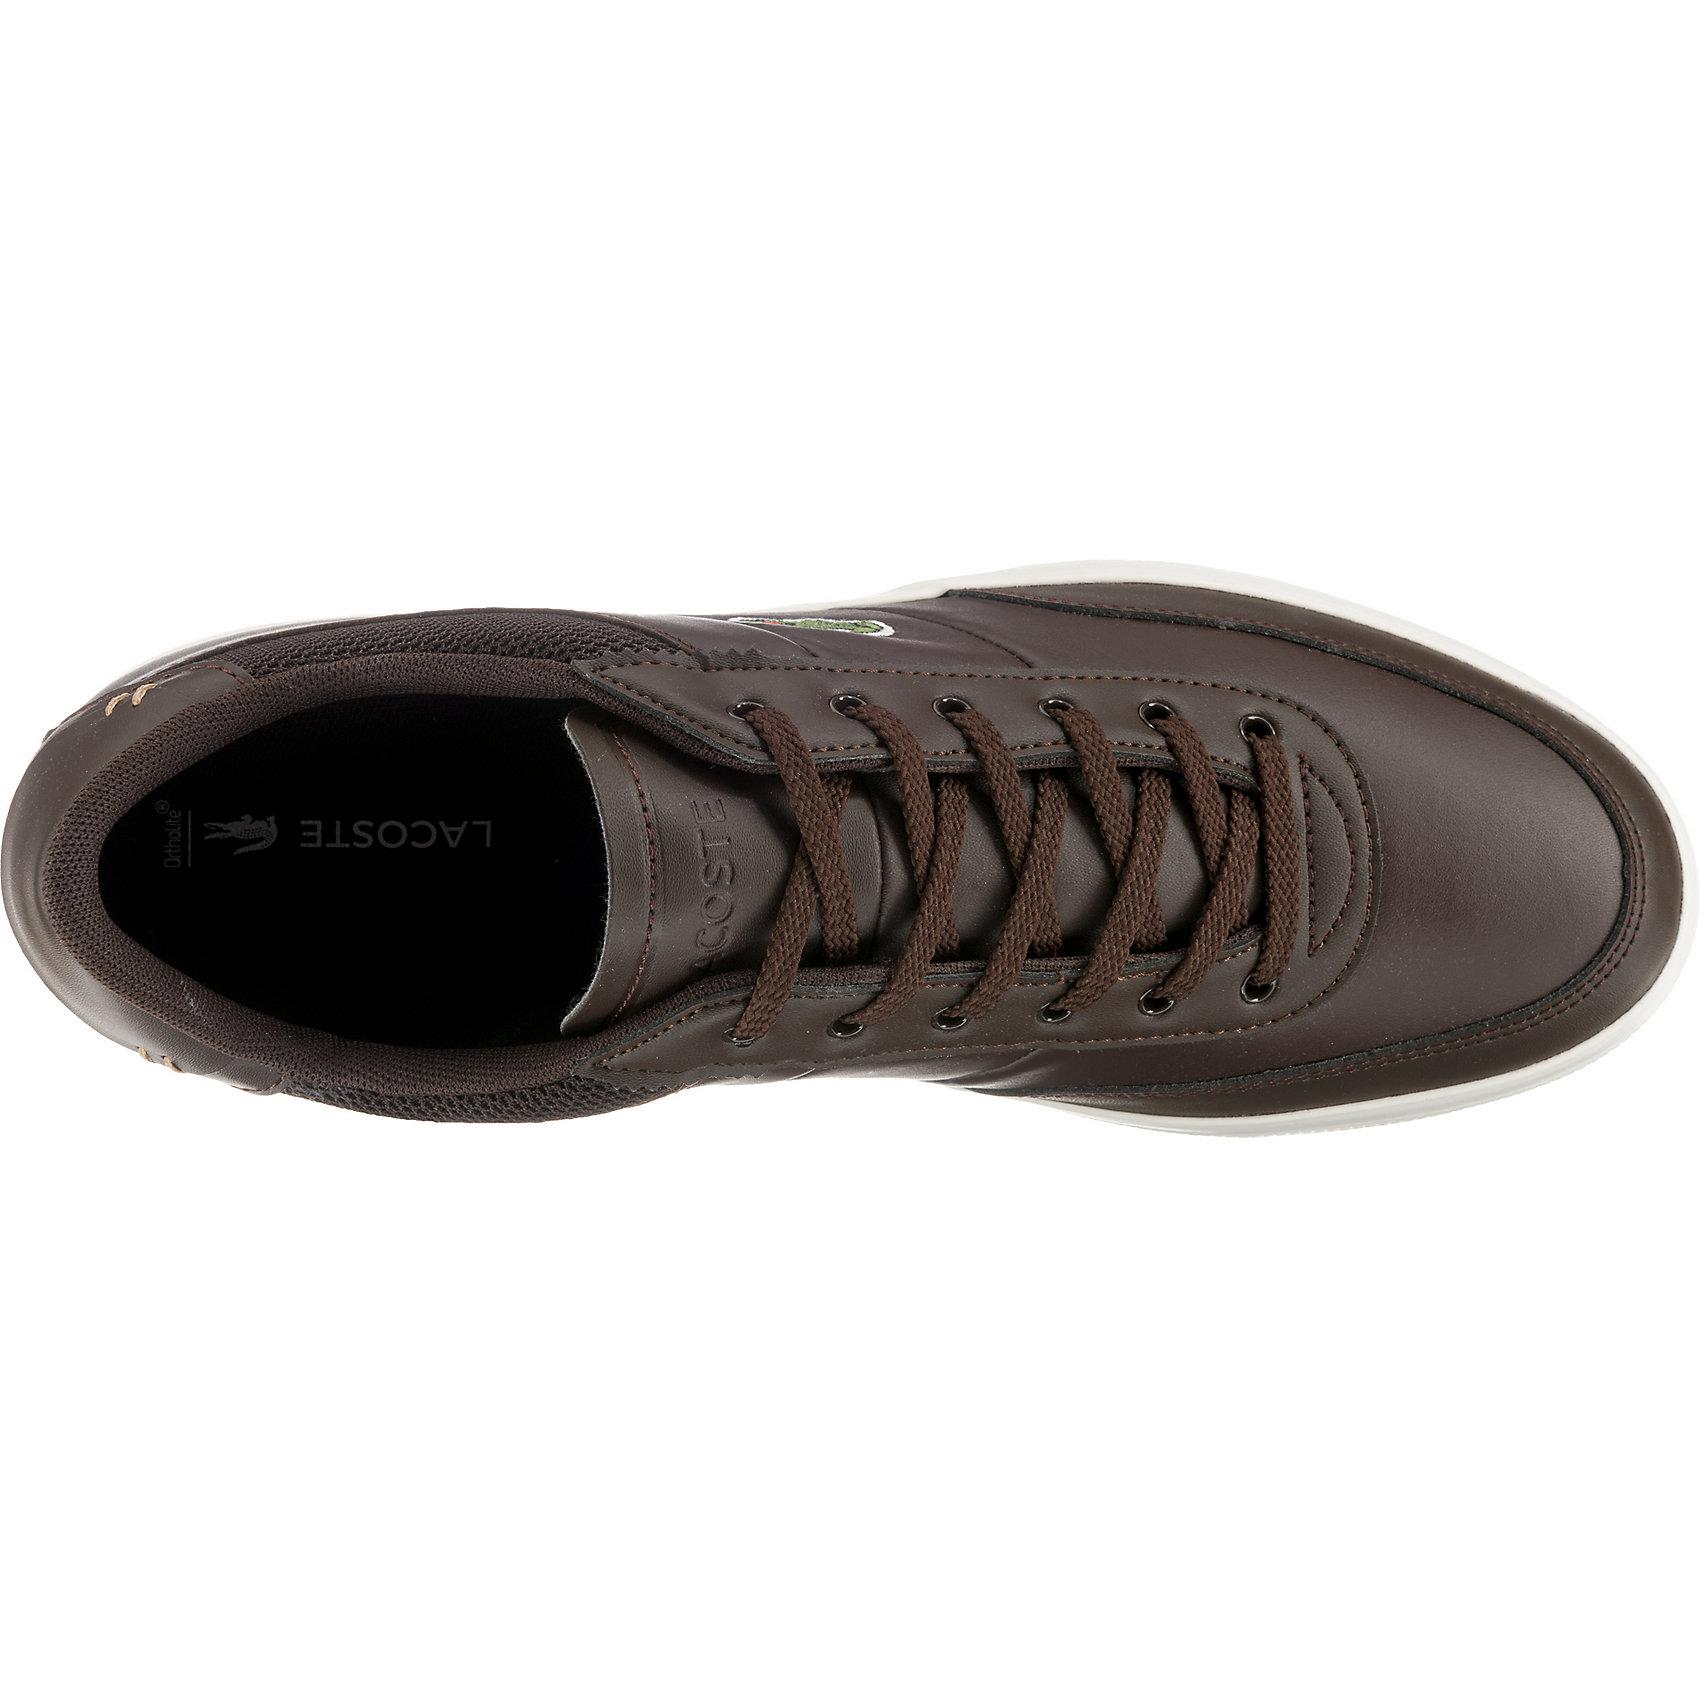 Neu Cam LACOSTE Chaymon 118 2 Cam Neu Sneakers 7064549 für Herren d95a56